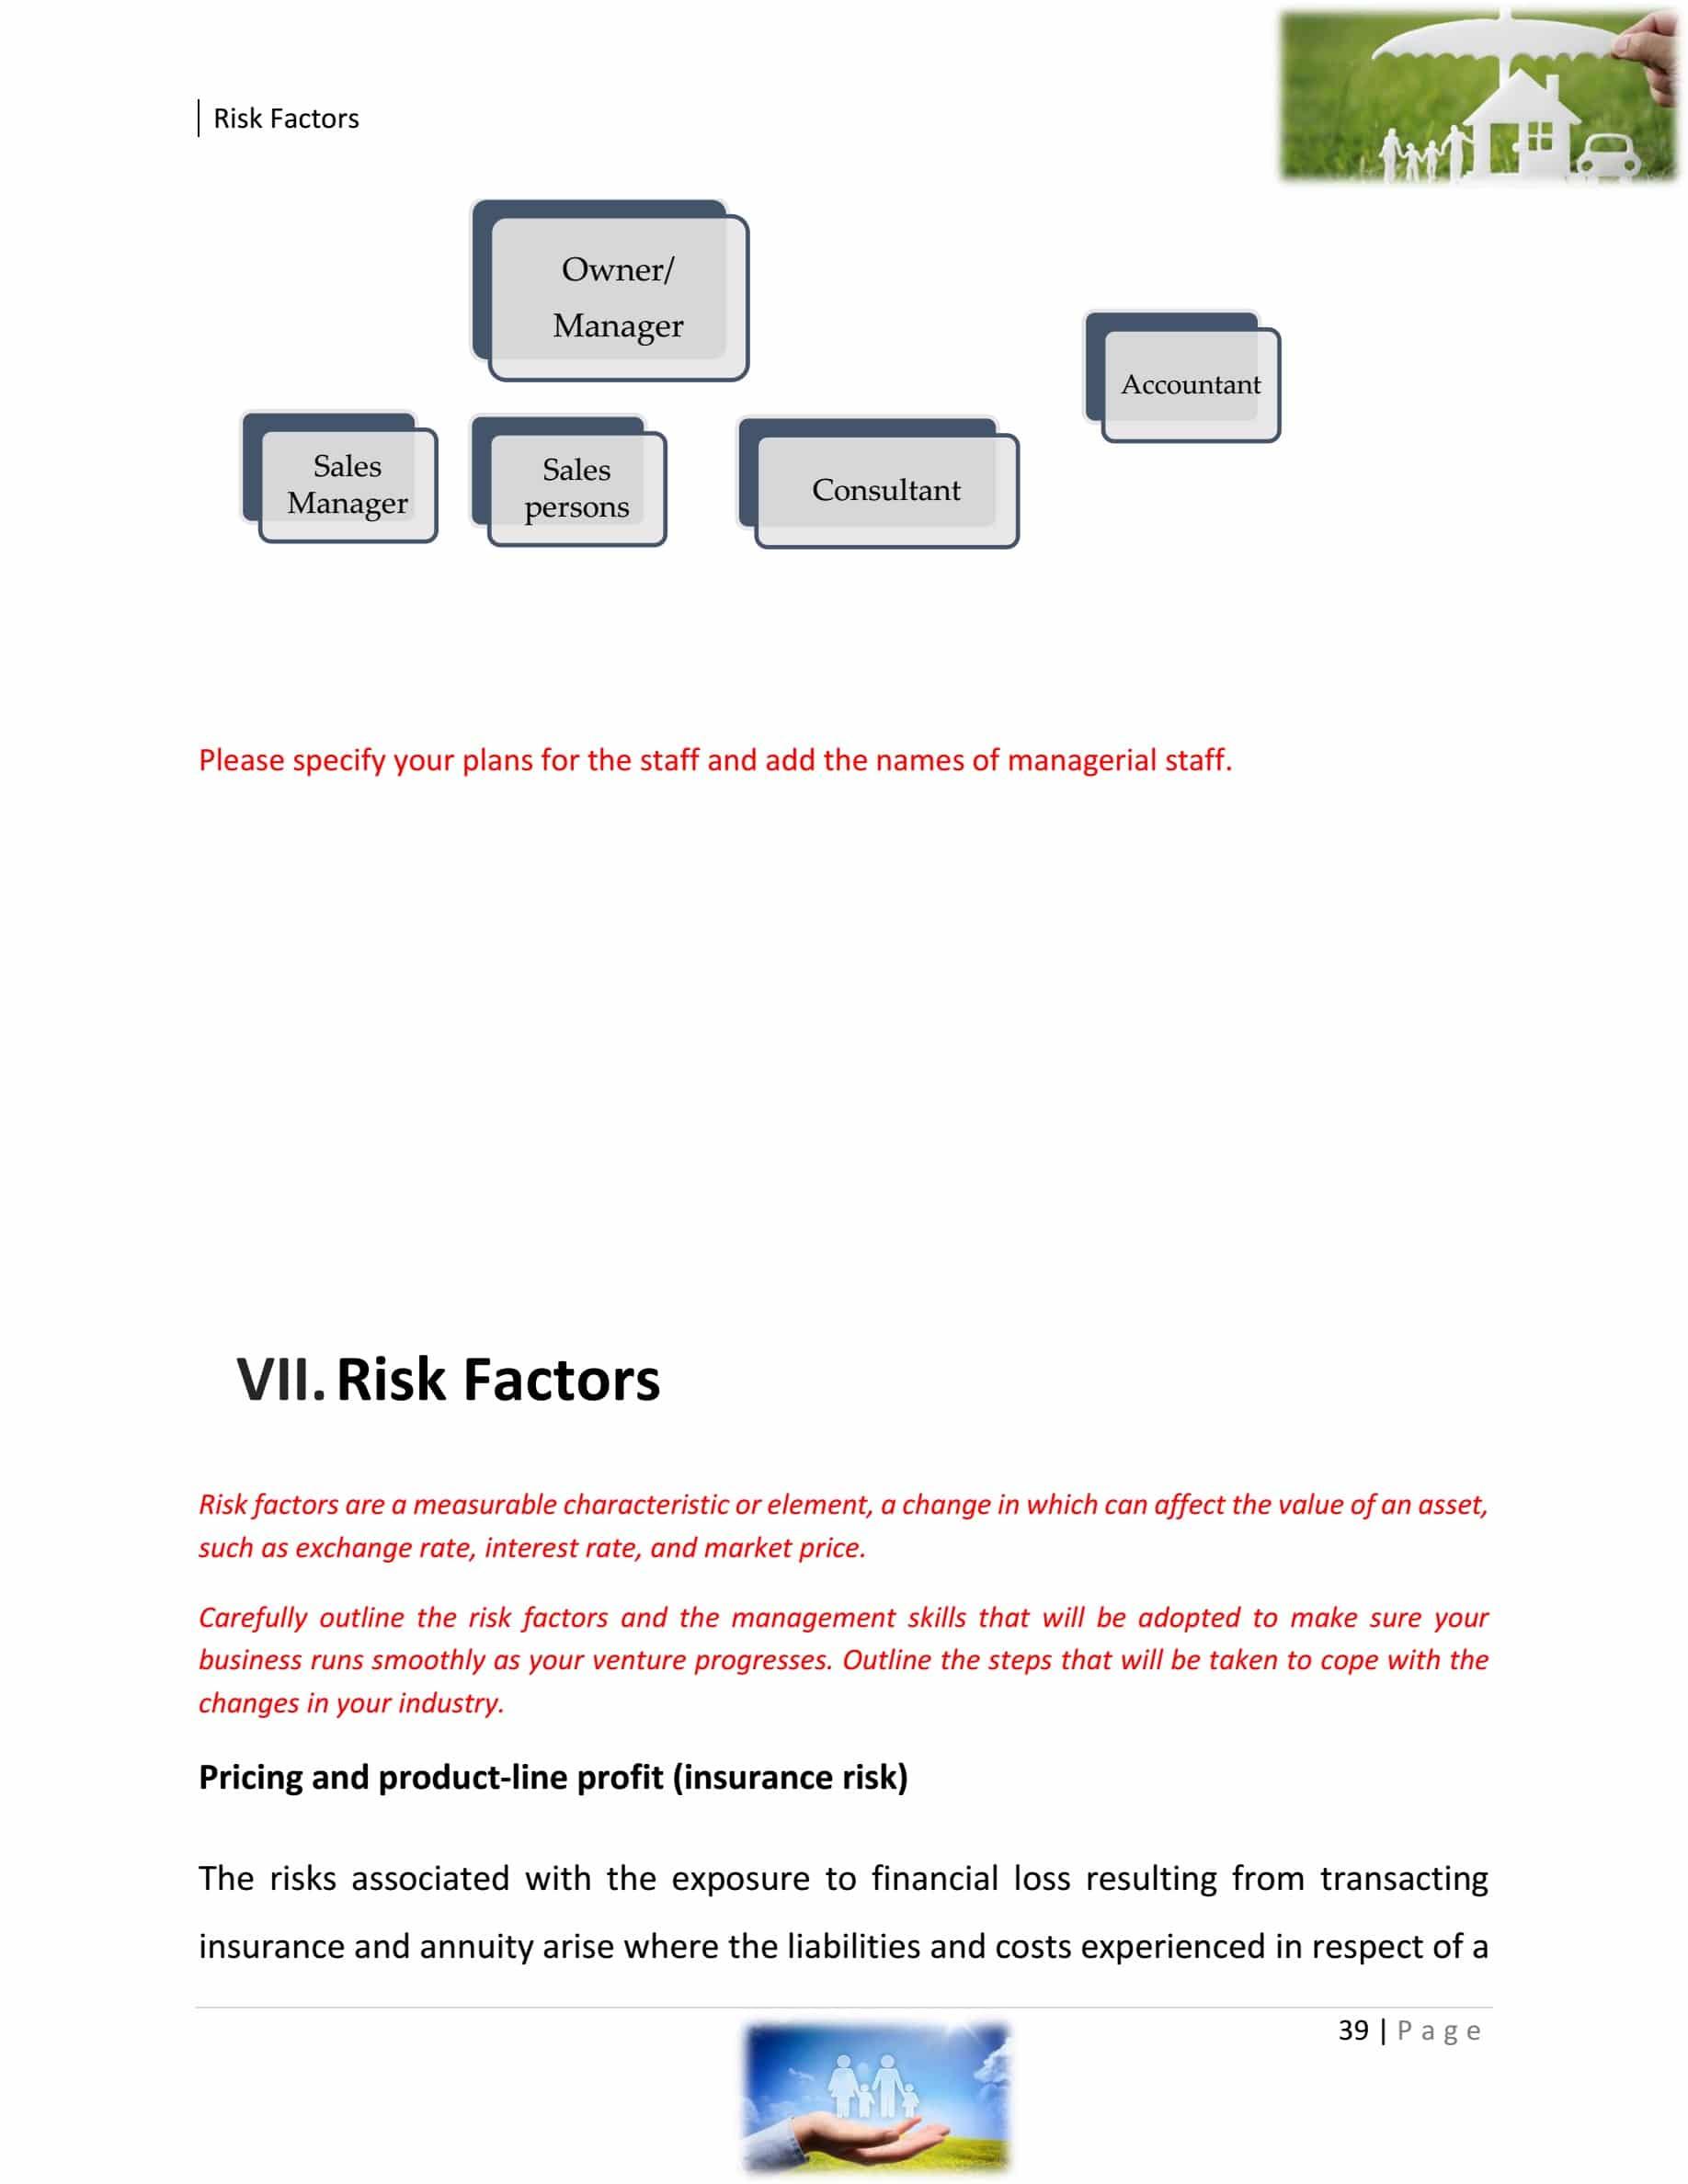 Cope Insurance Worksheet | TUTORE.ORG - Master of Documents